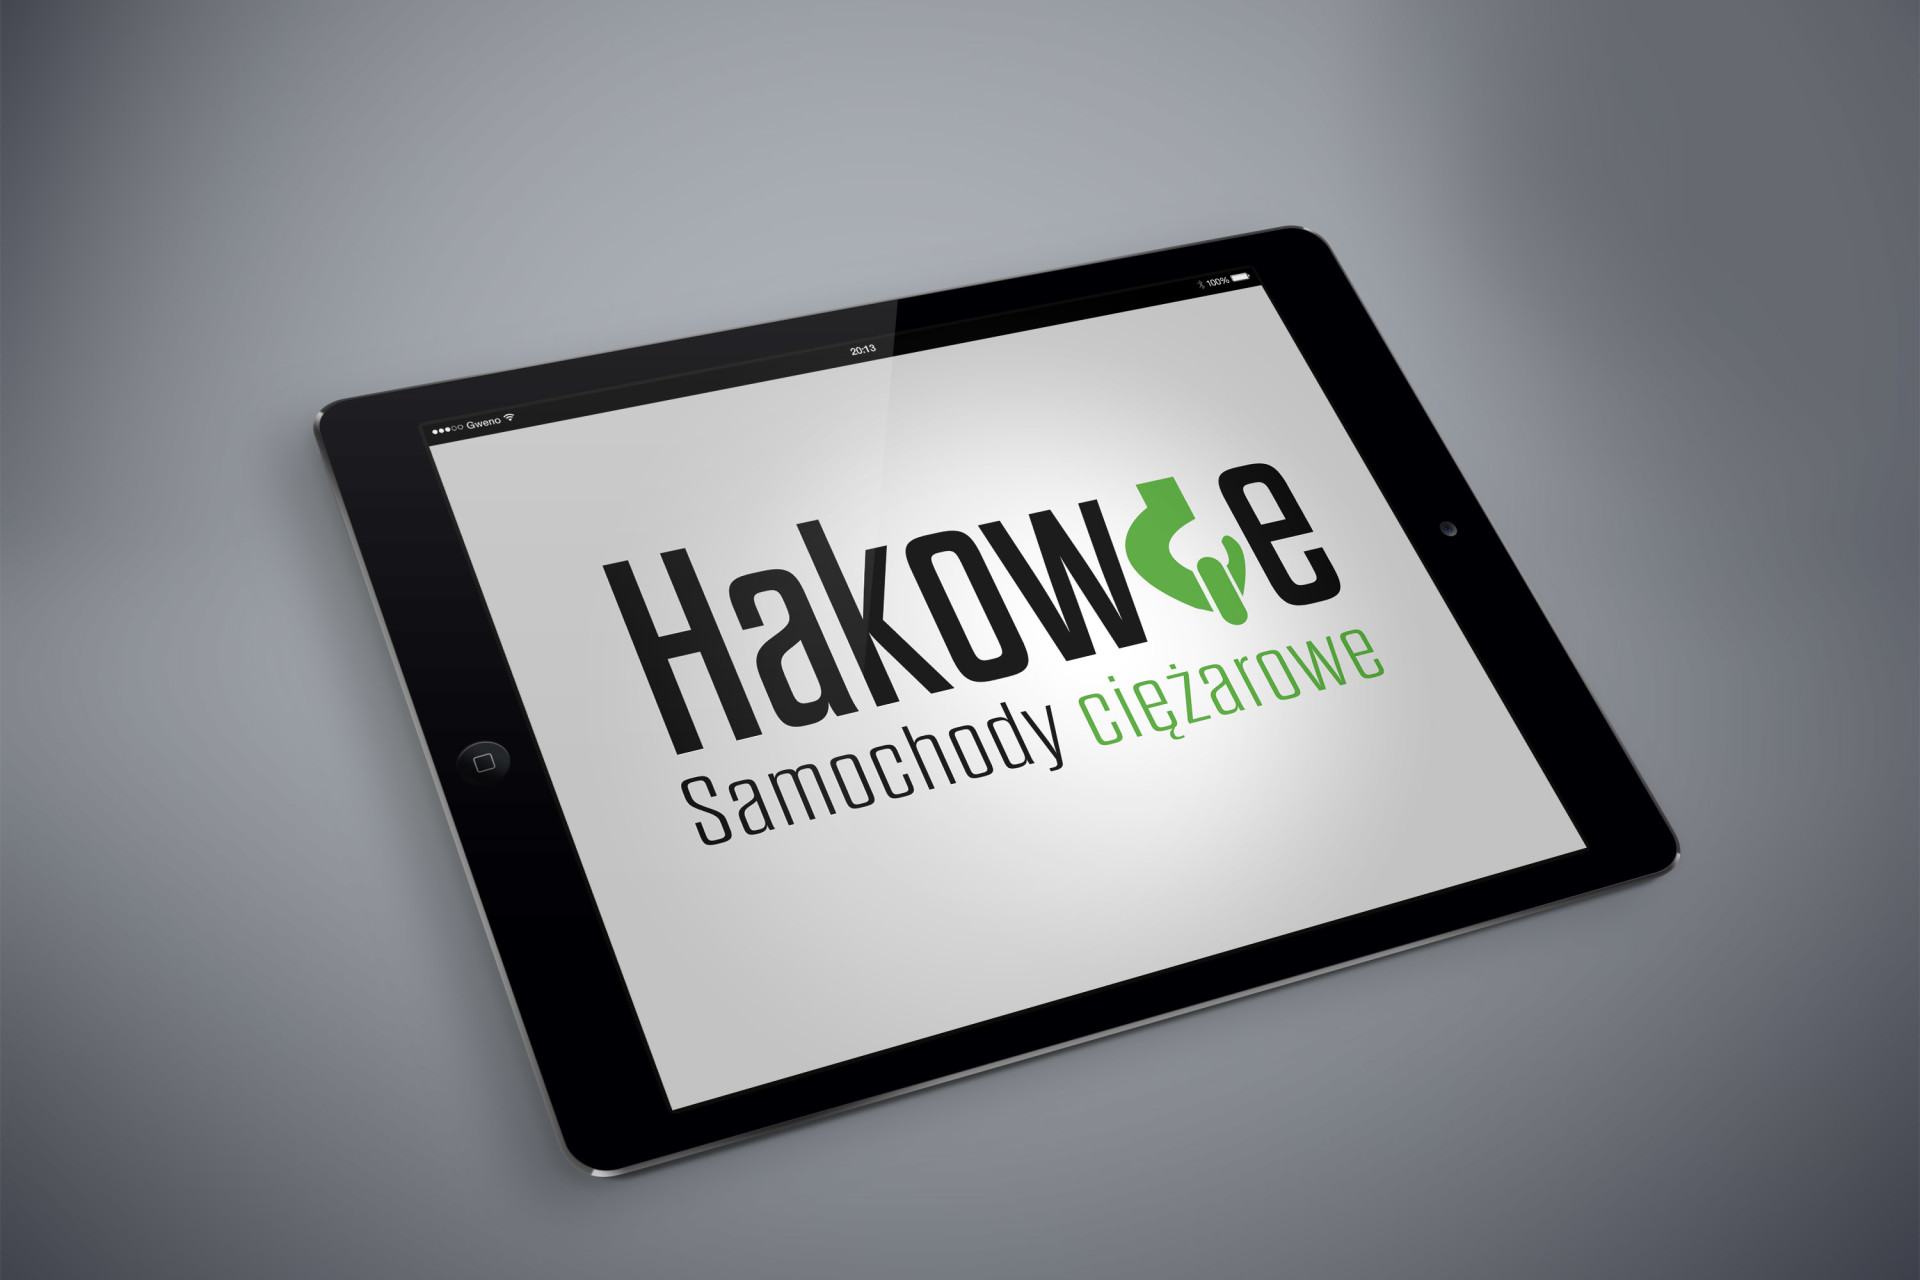 hakowce